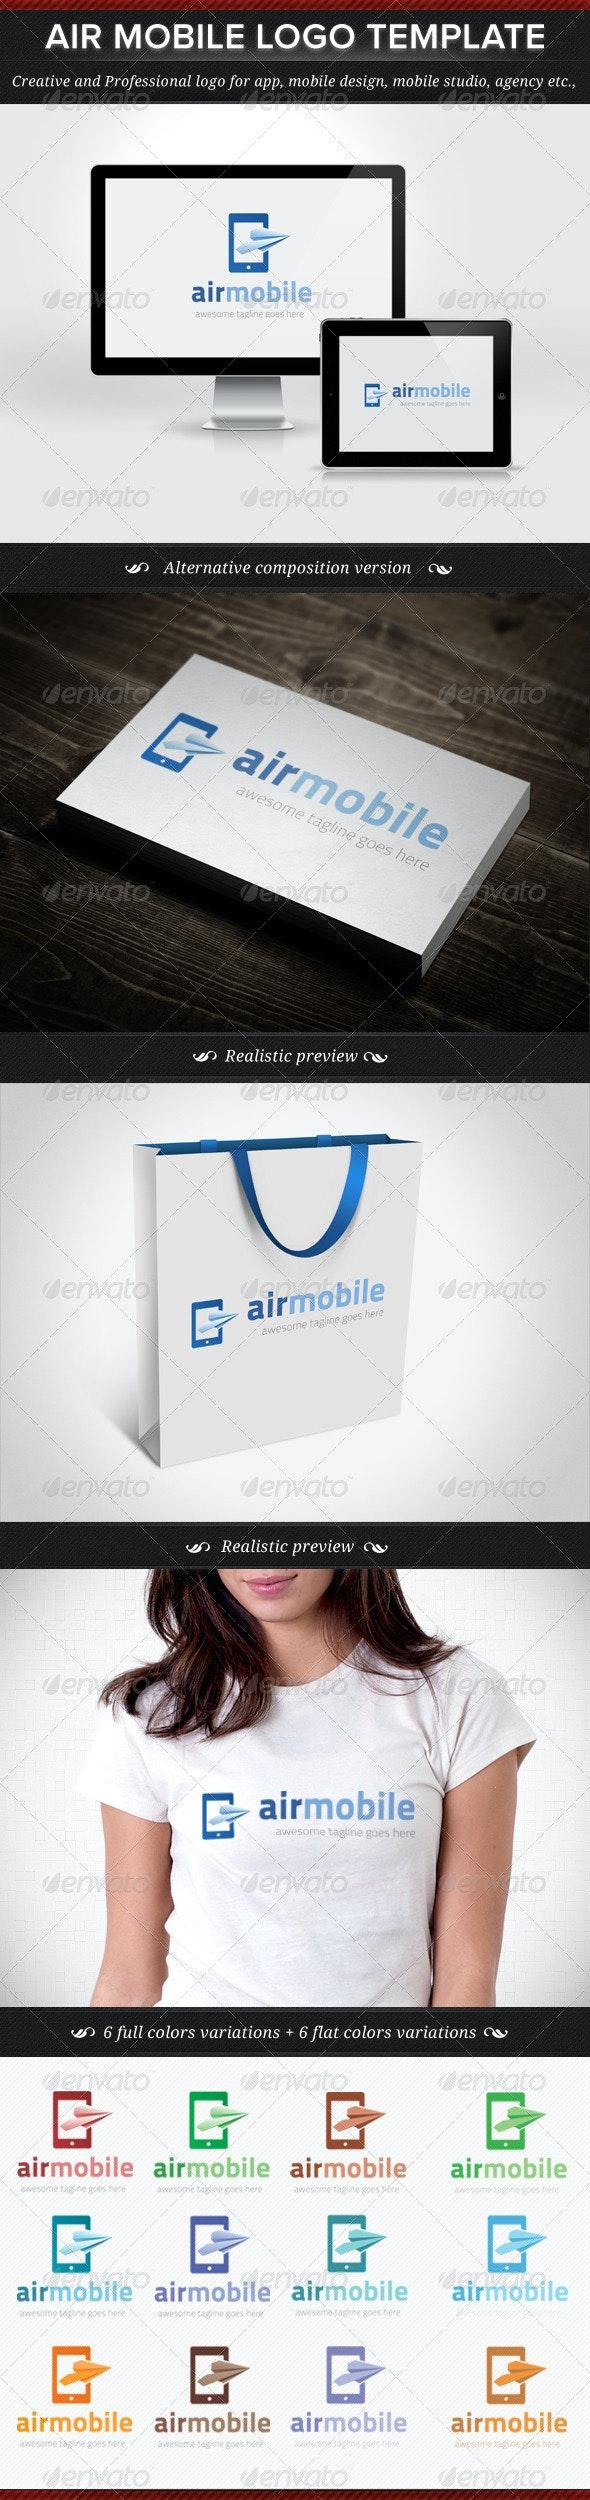 Air Mobile Logo Template